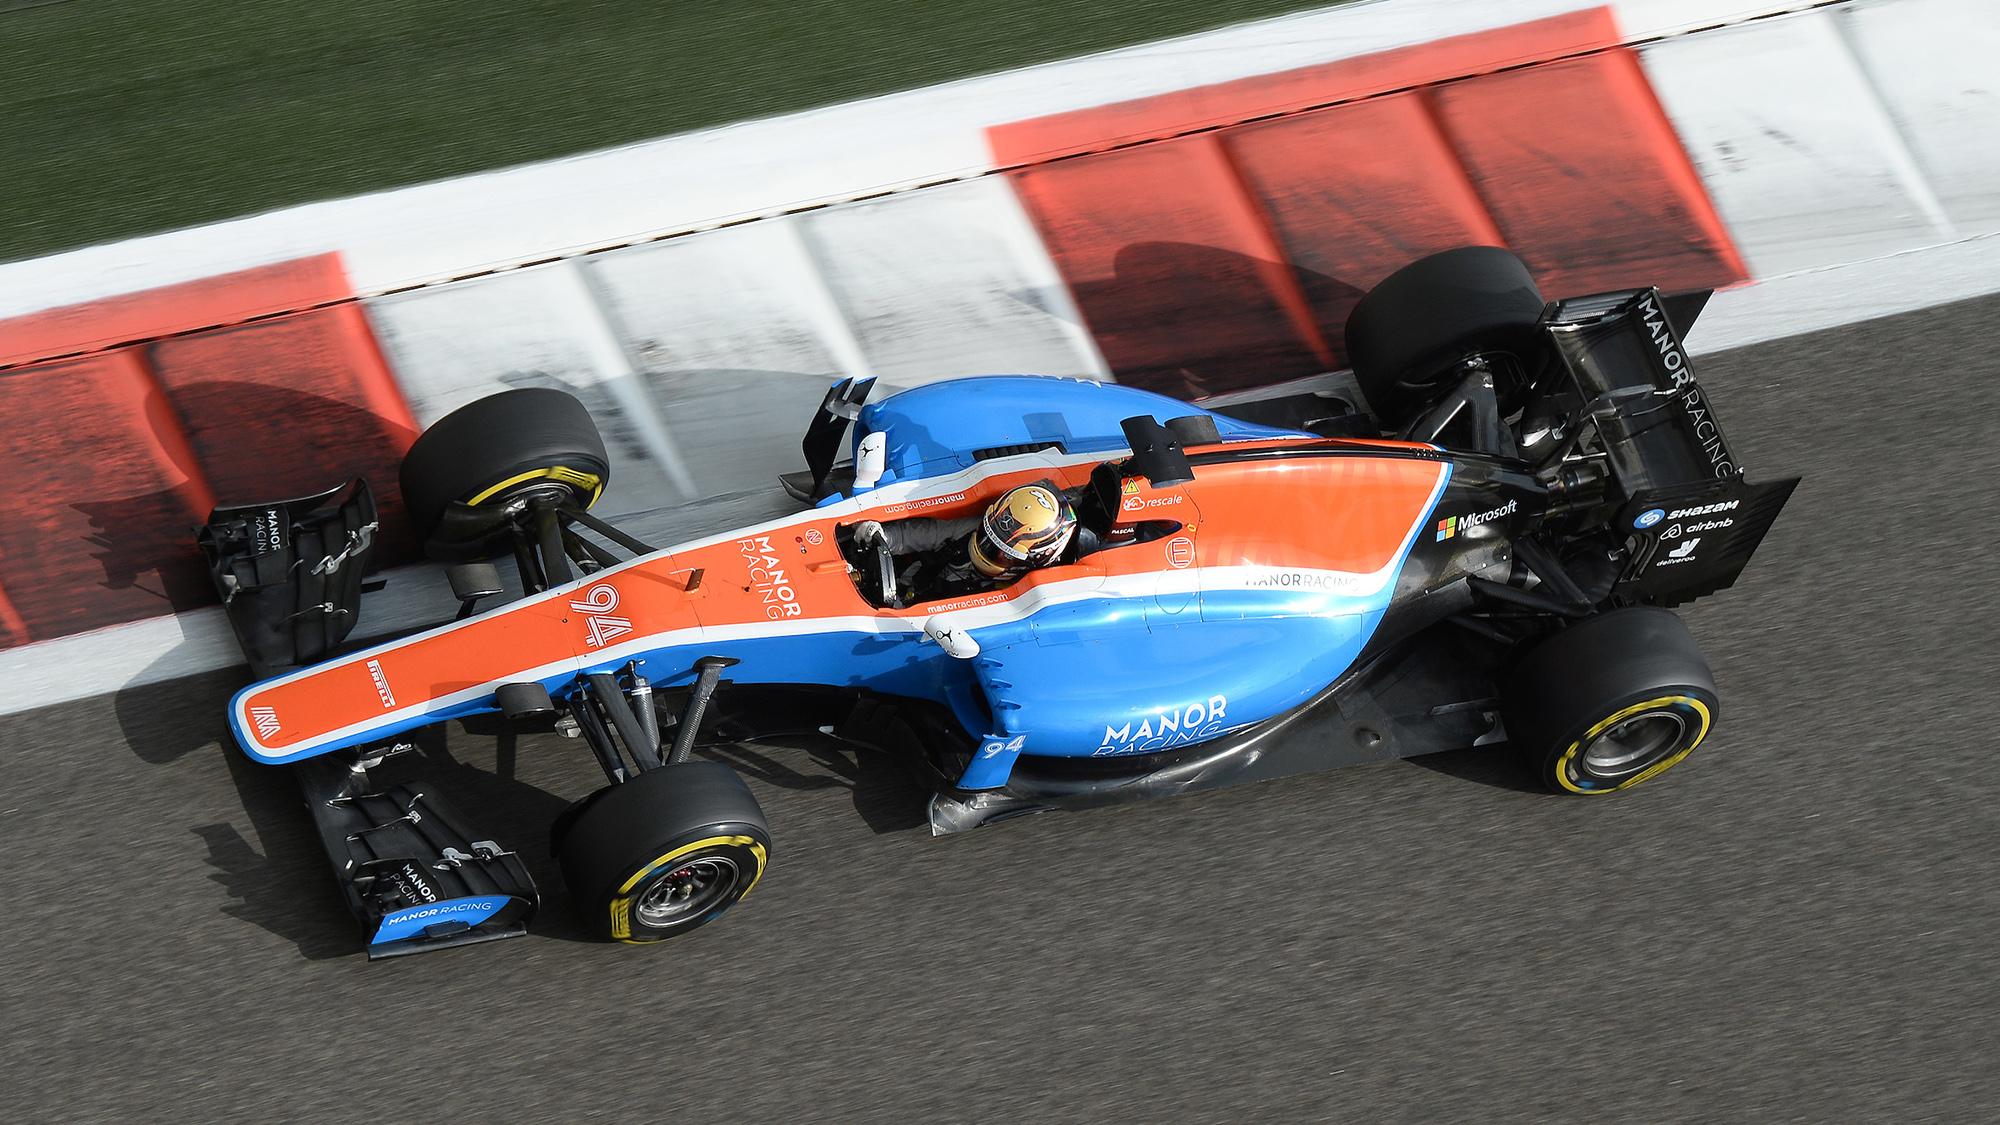 Manor Racing Database